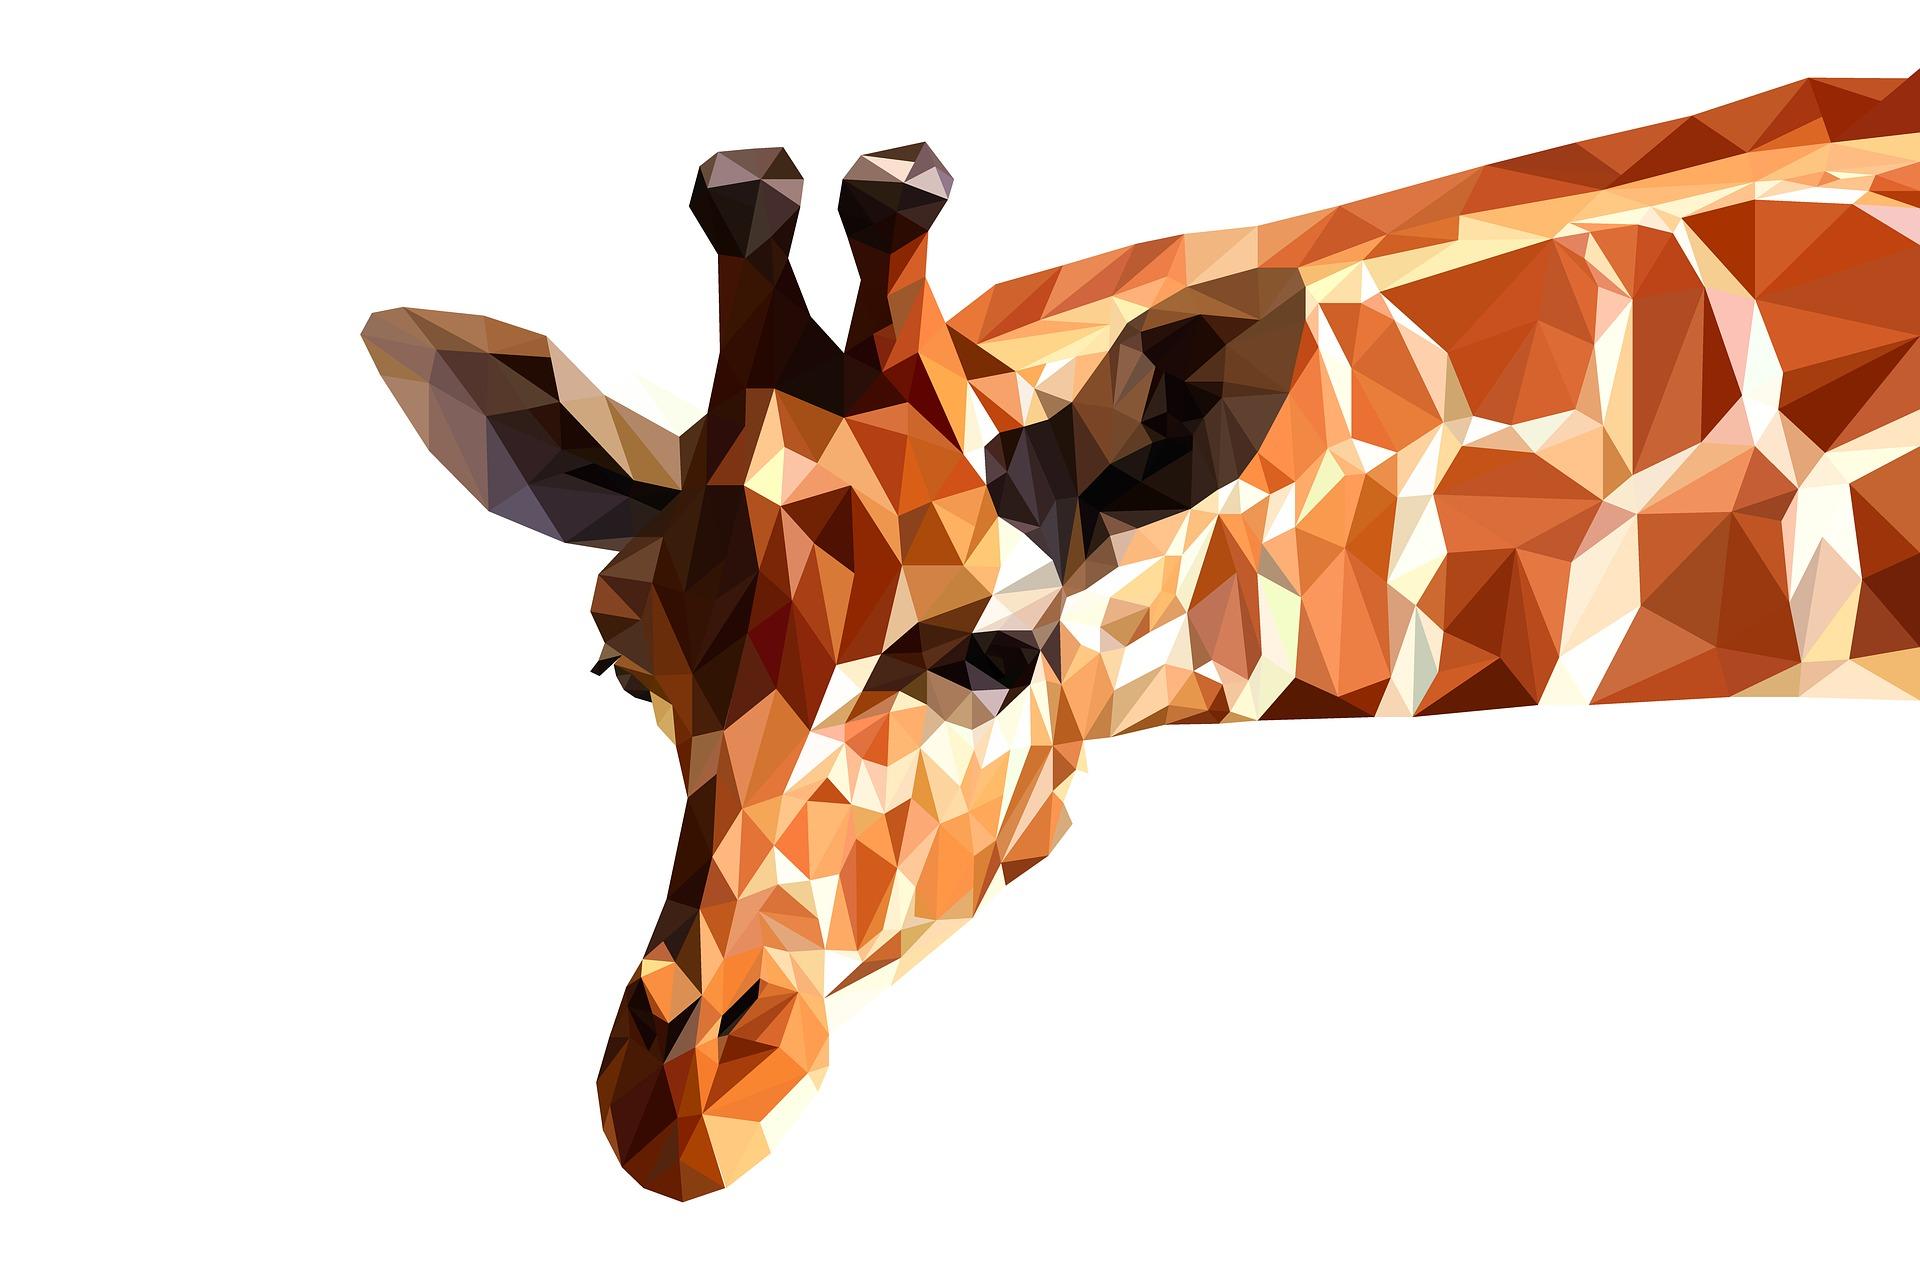 giraffe-3239743_1920